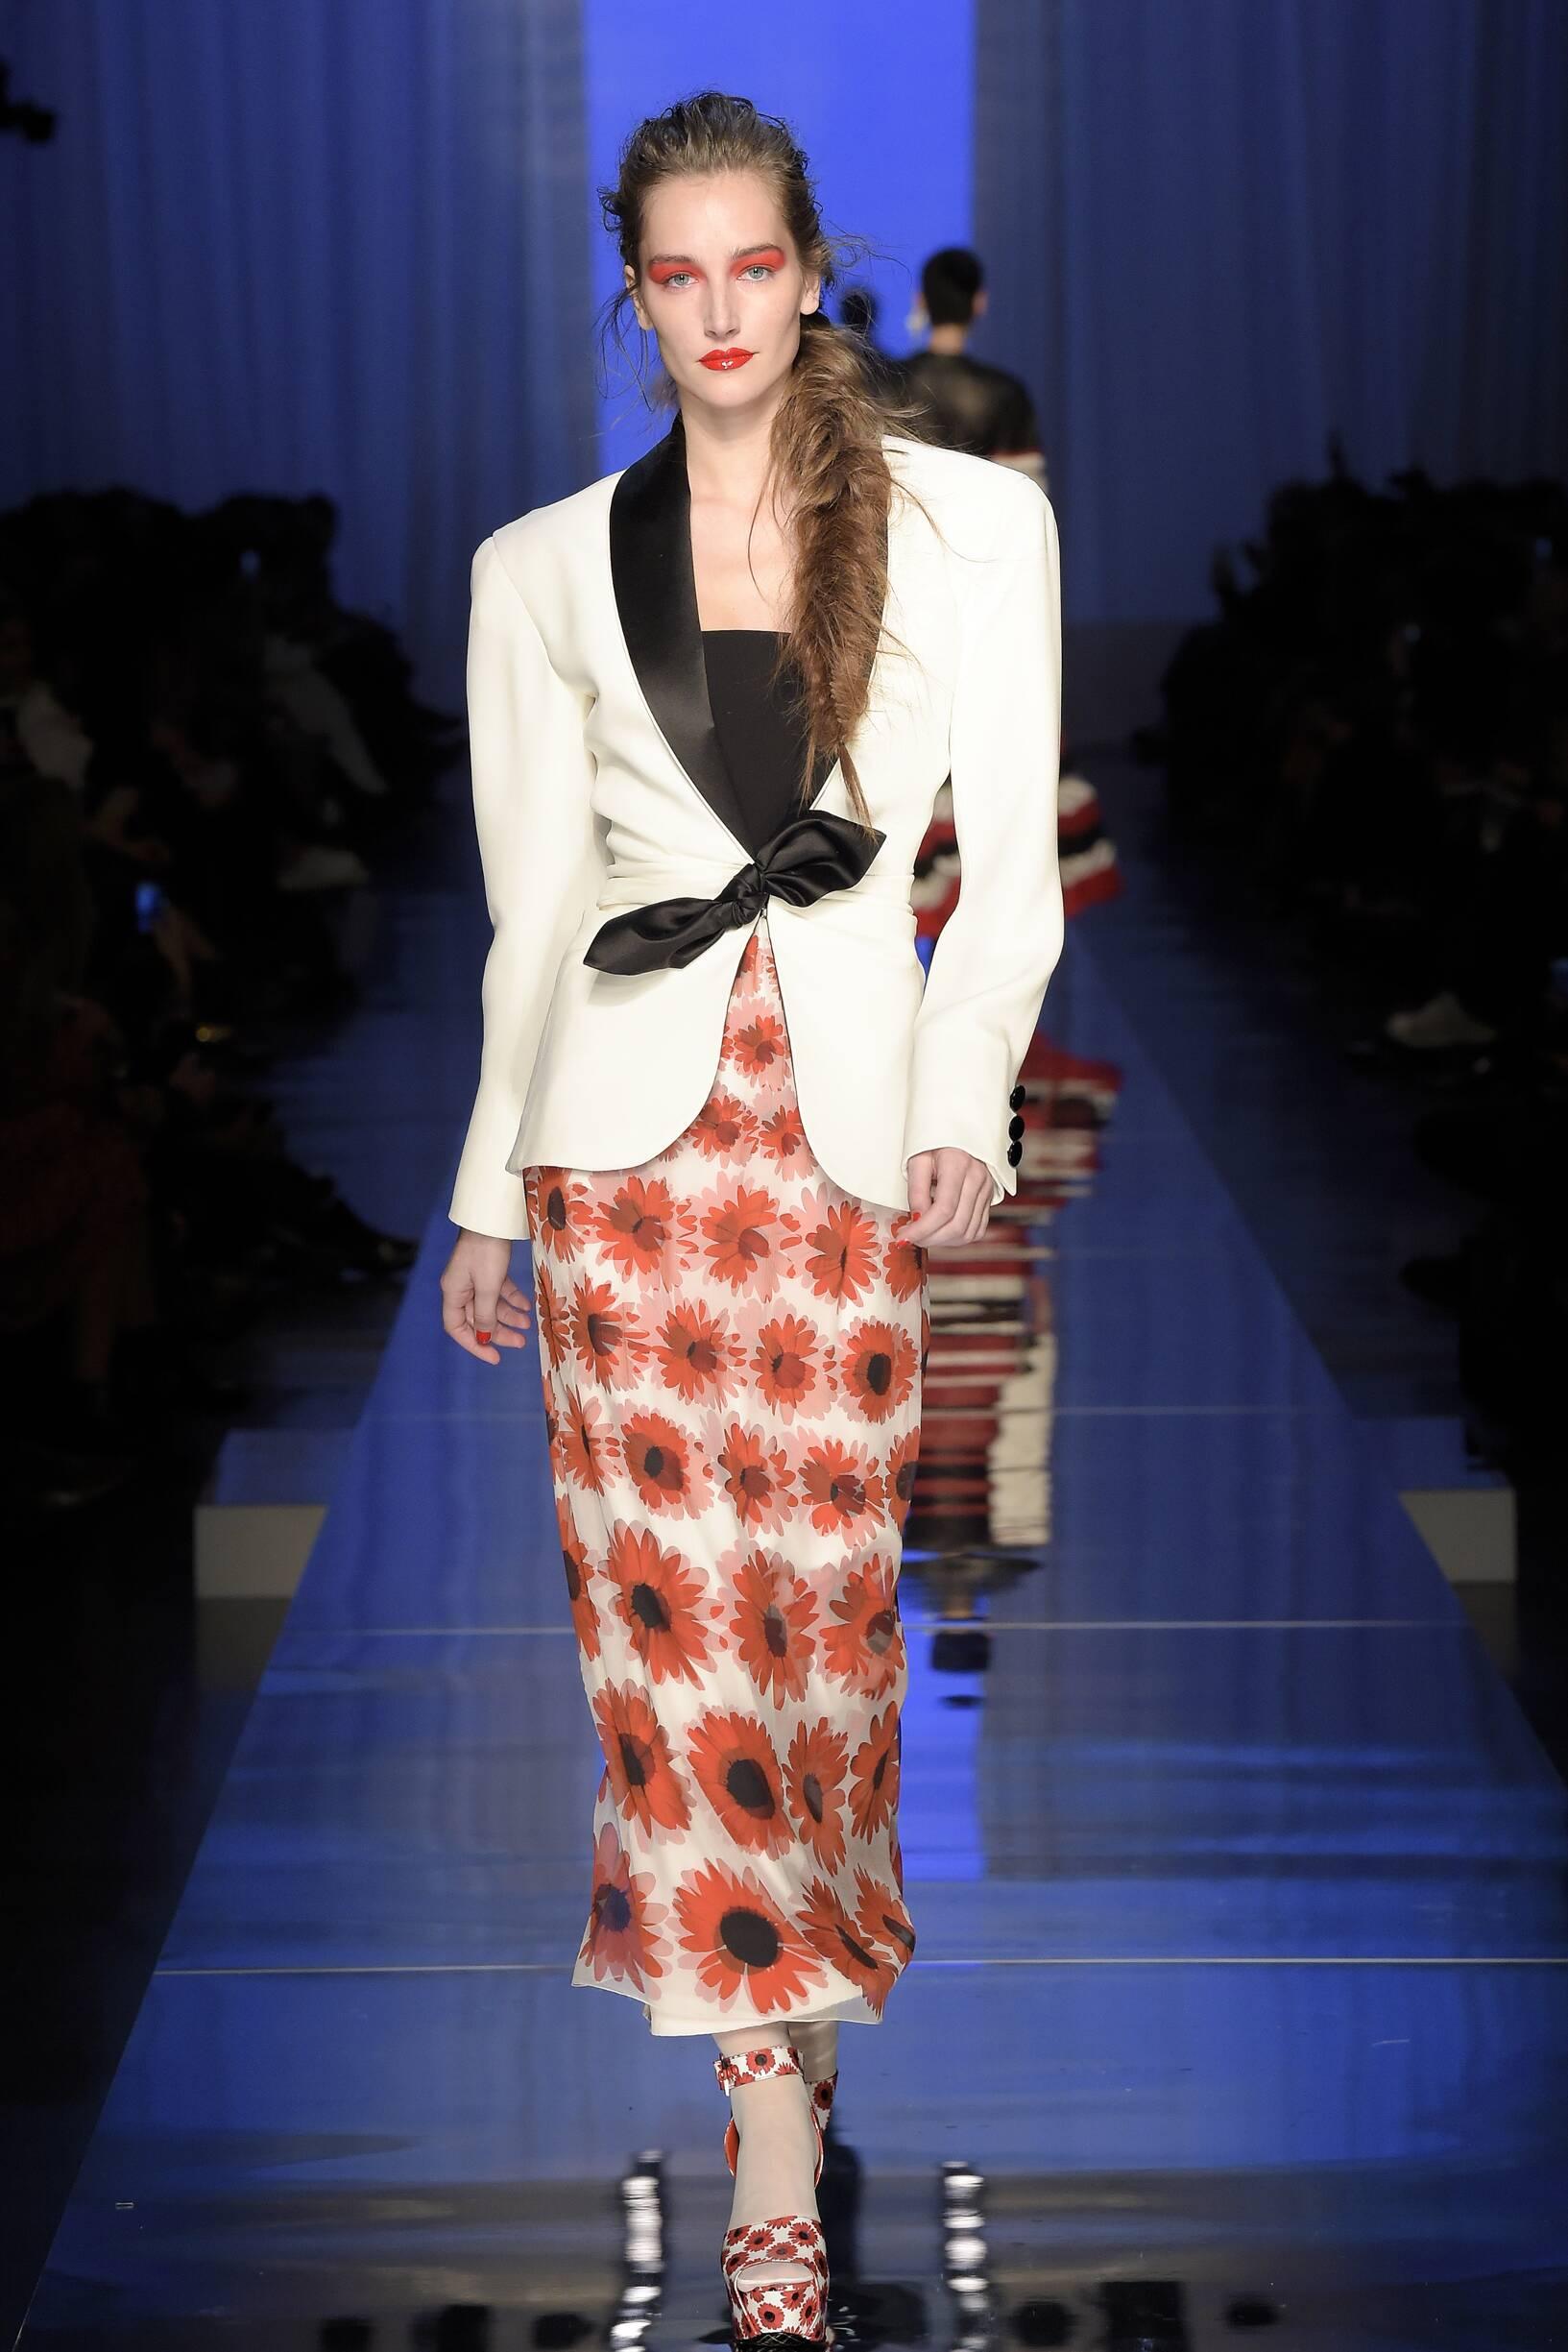 Woman Catwalk Jean Paul Gaultier Haute Couture